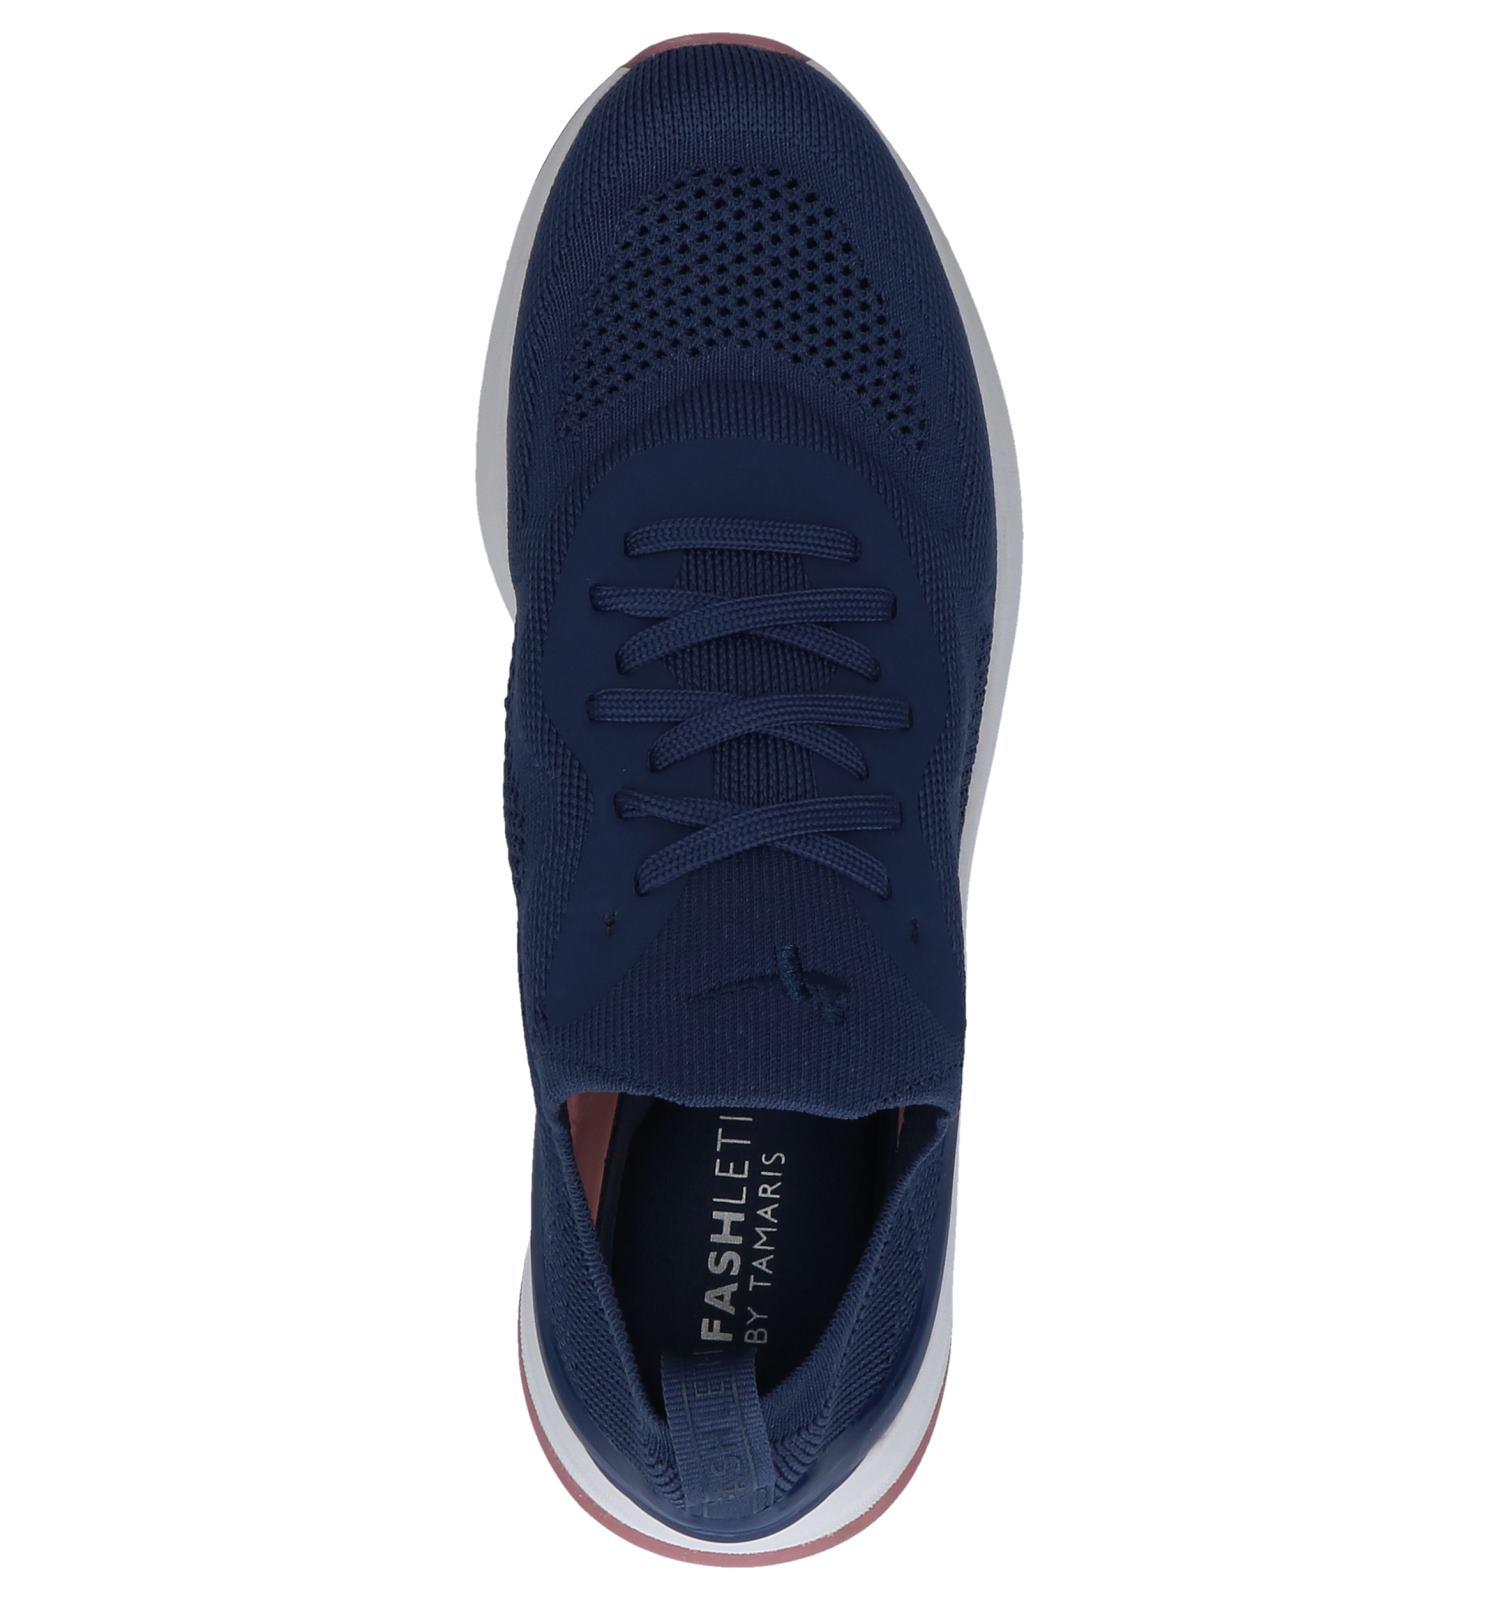 Slip on Donkerblauwe Fashletics Tamaris Sneakers IyYfvb7m6g